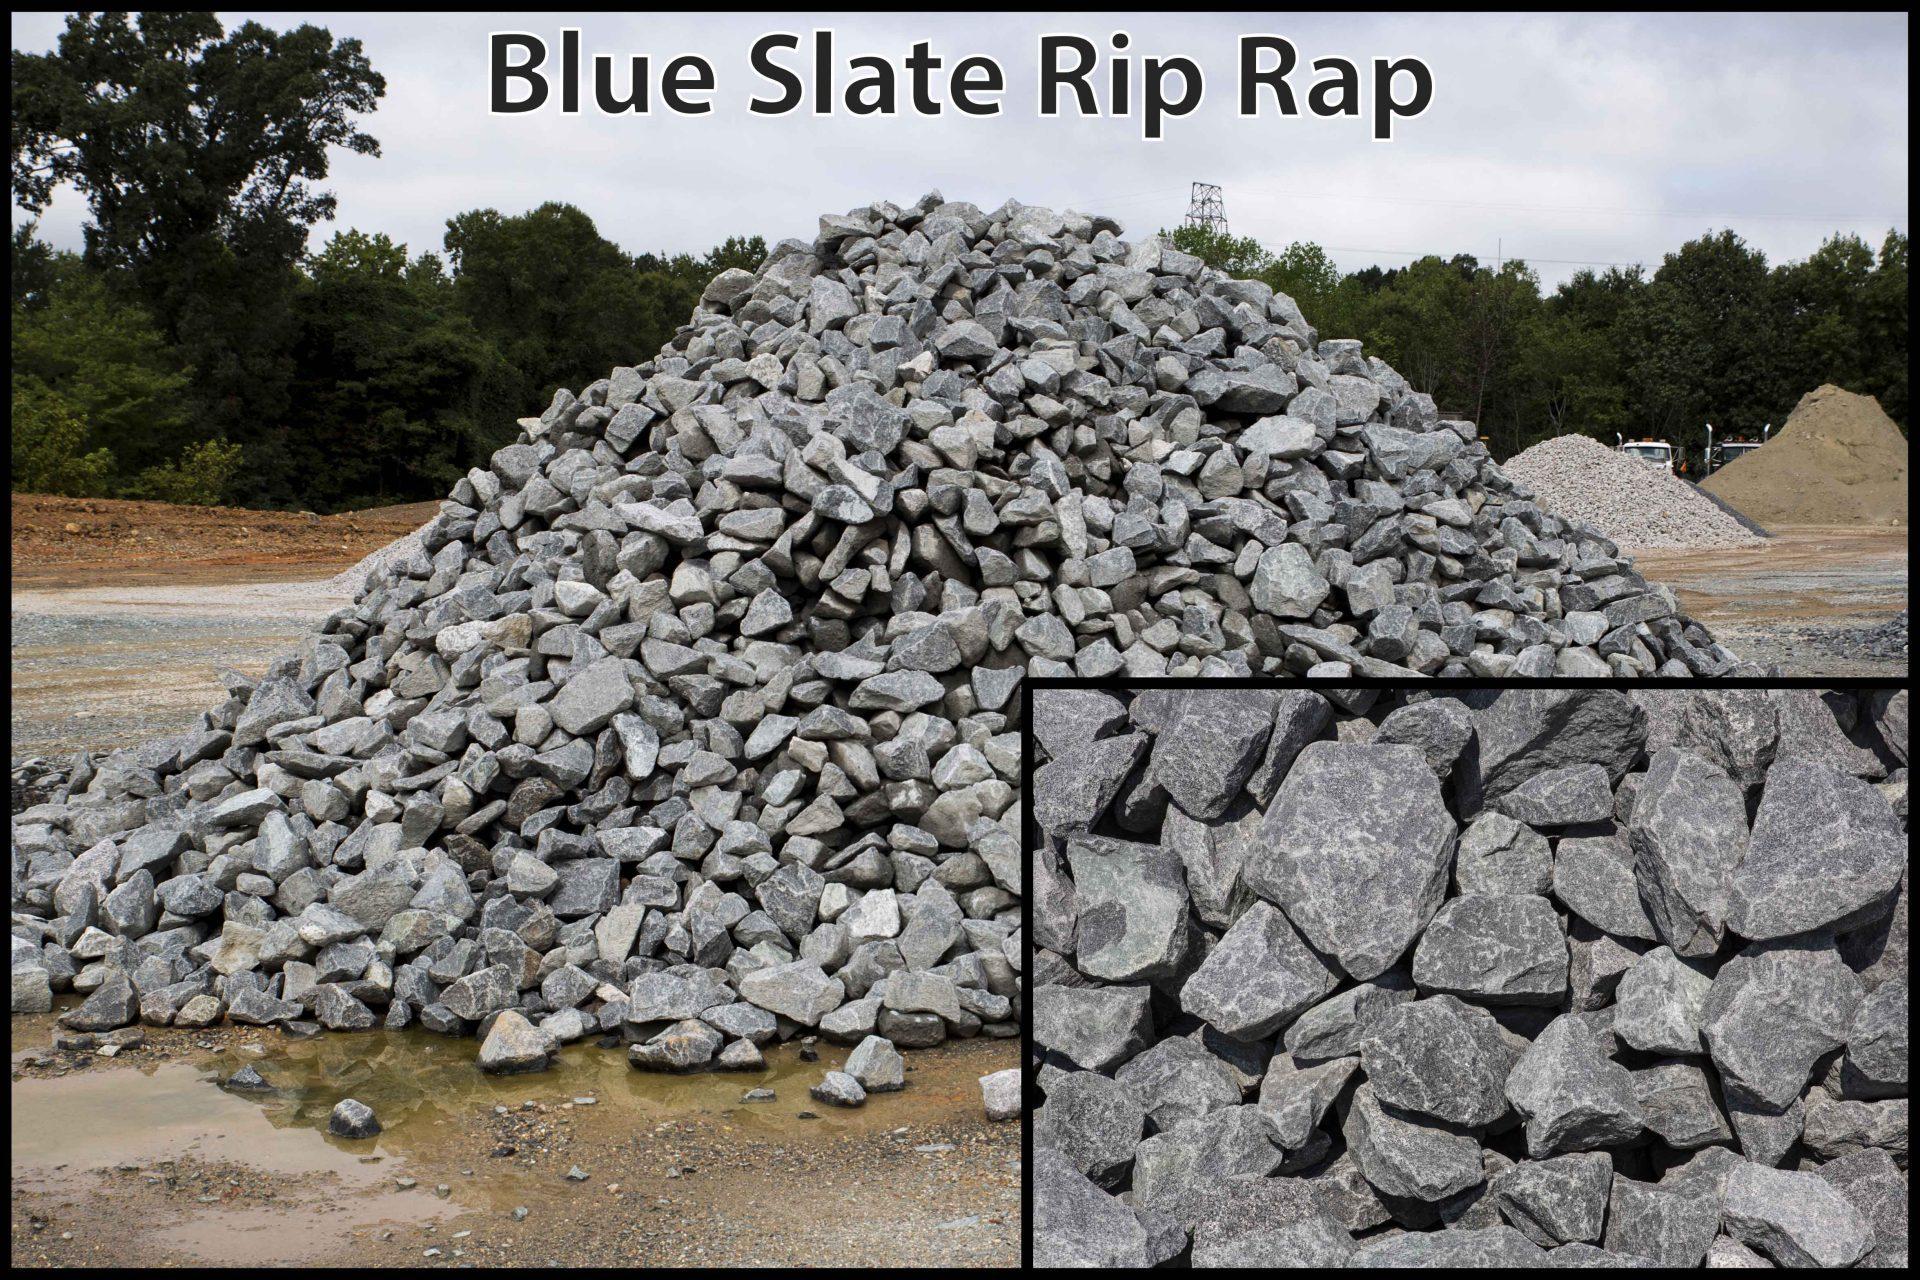 Blue Slate Rip Rap